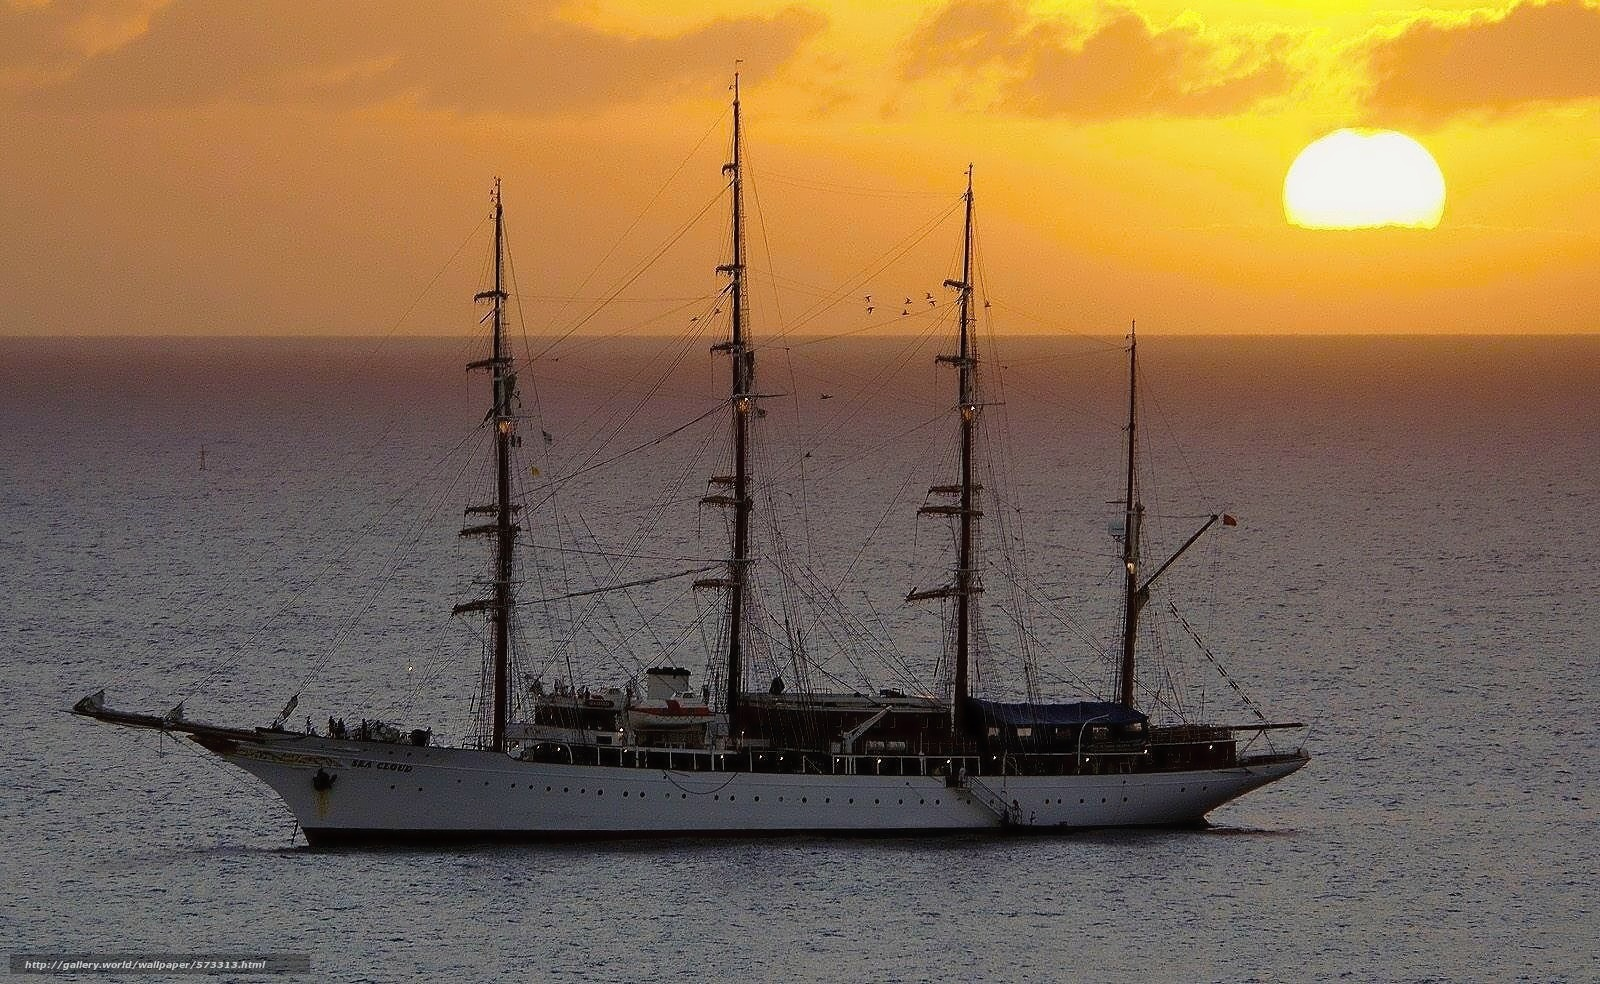 ship, parusnik.yahta, ship, ships, frigate, sea, sunset, landscapes